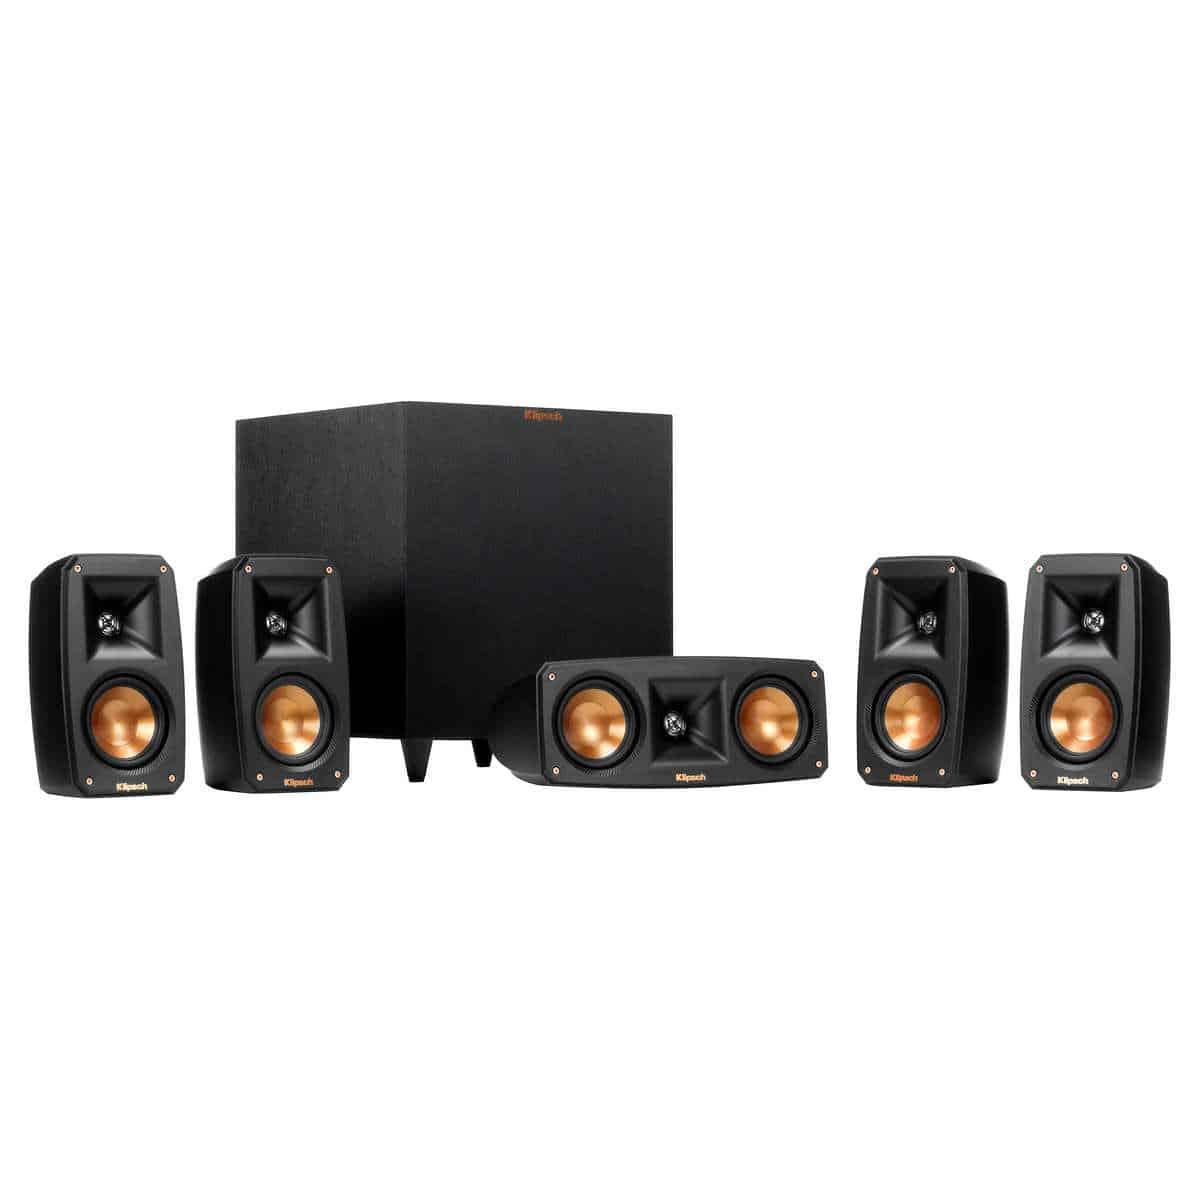 Klipsch-Audio-Technologies